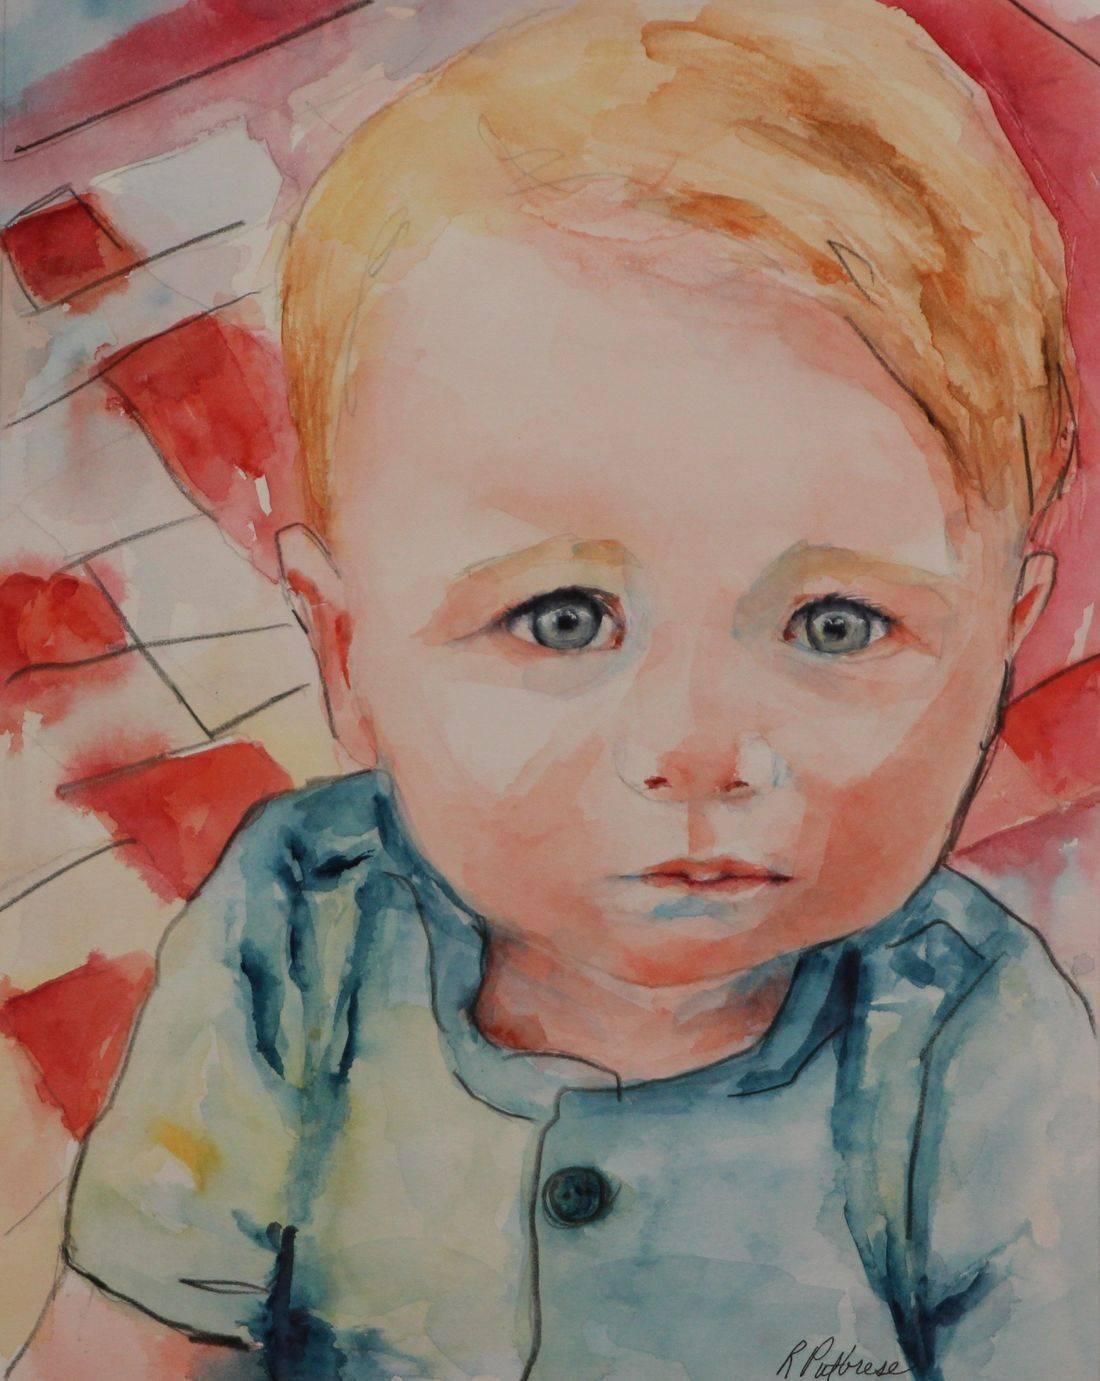 Watercolor portrait by Becky/Rebecca Krutsinger at rputbresewatercolor.com